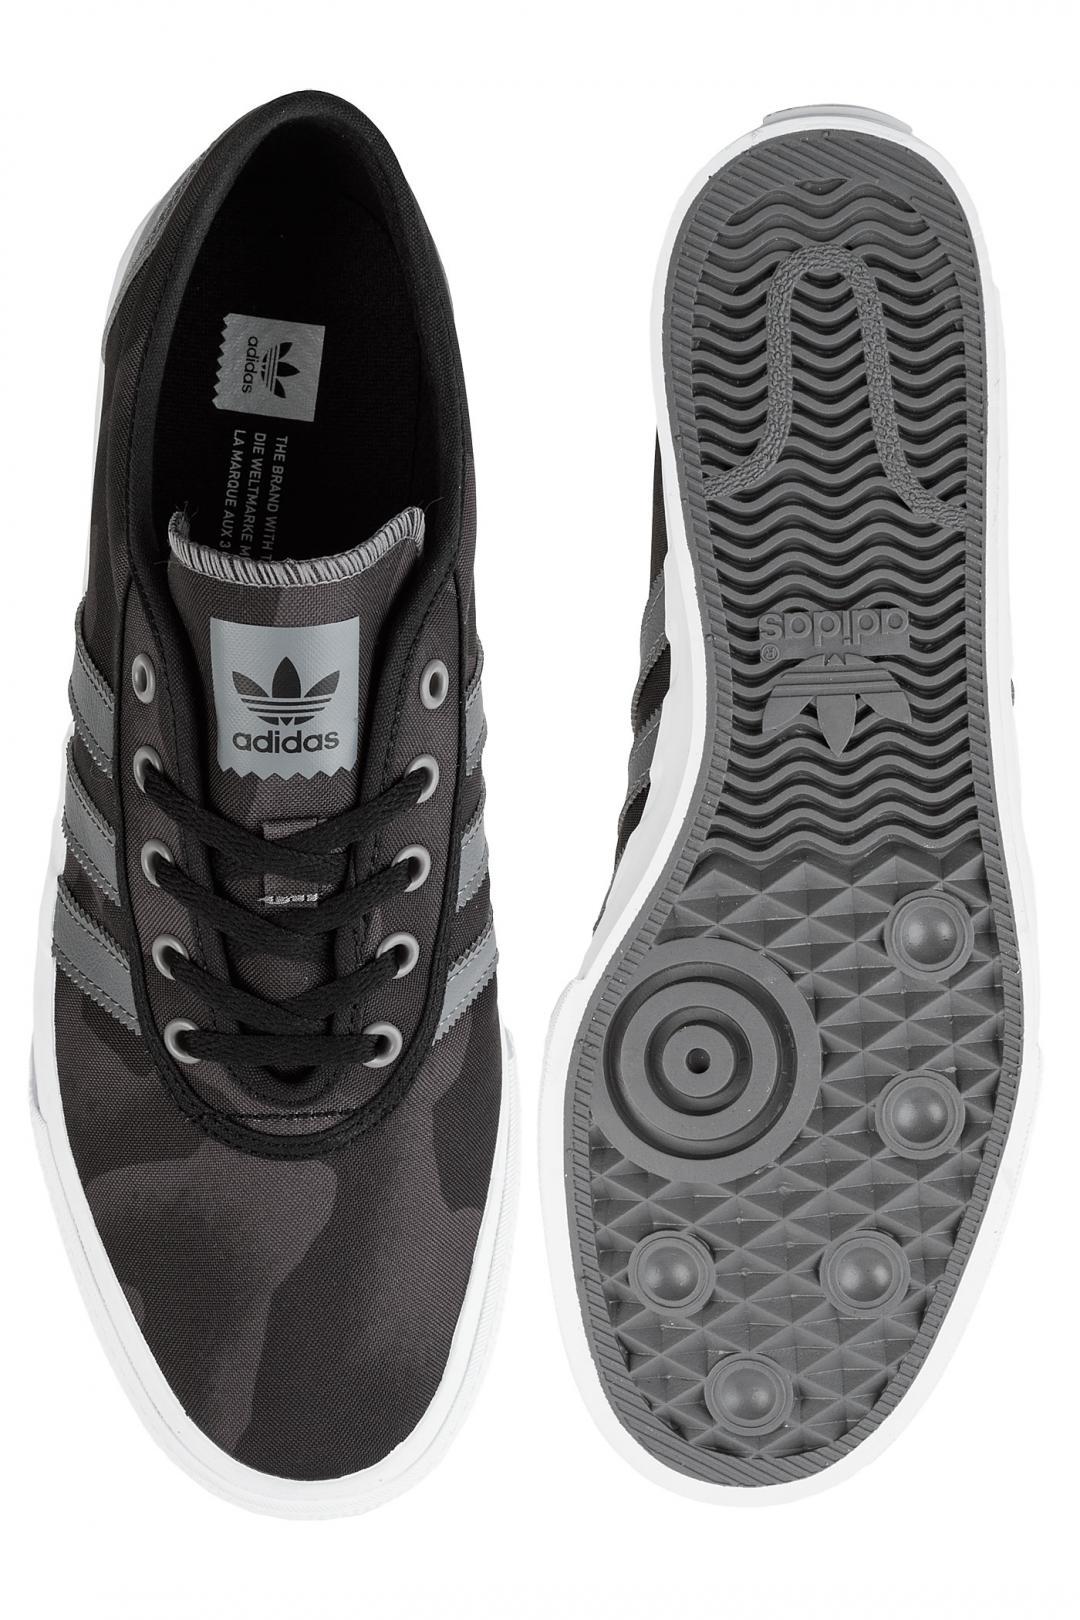 Uomo adidas Skateboarding Adi Ease core black white | Scarpe da skate